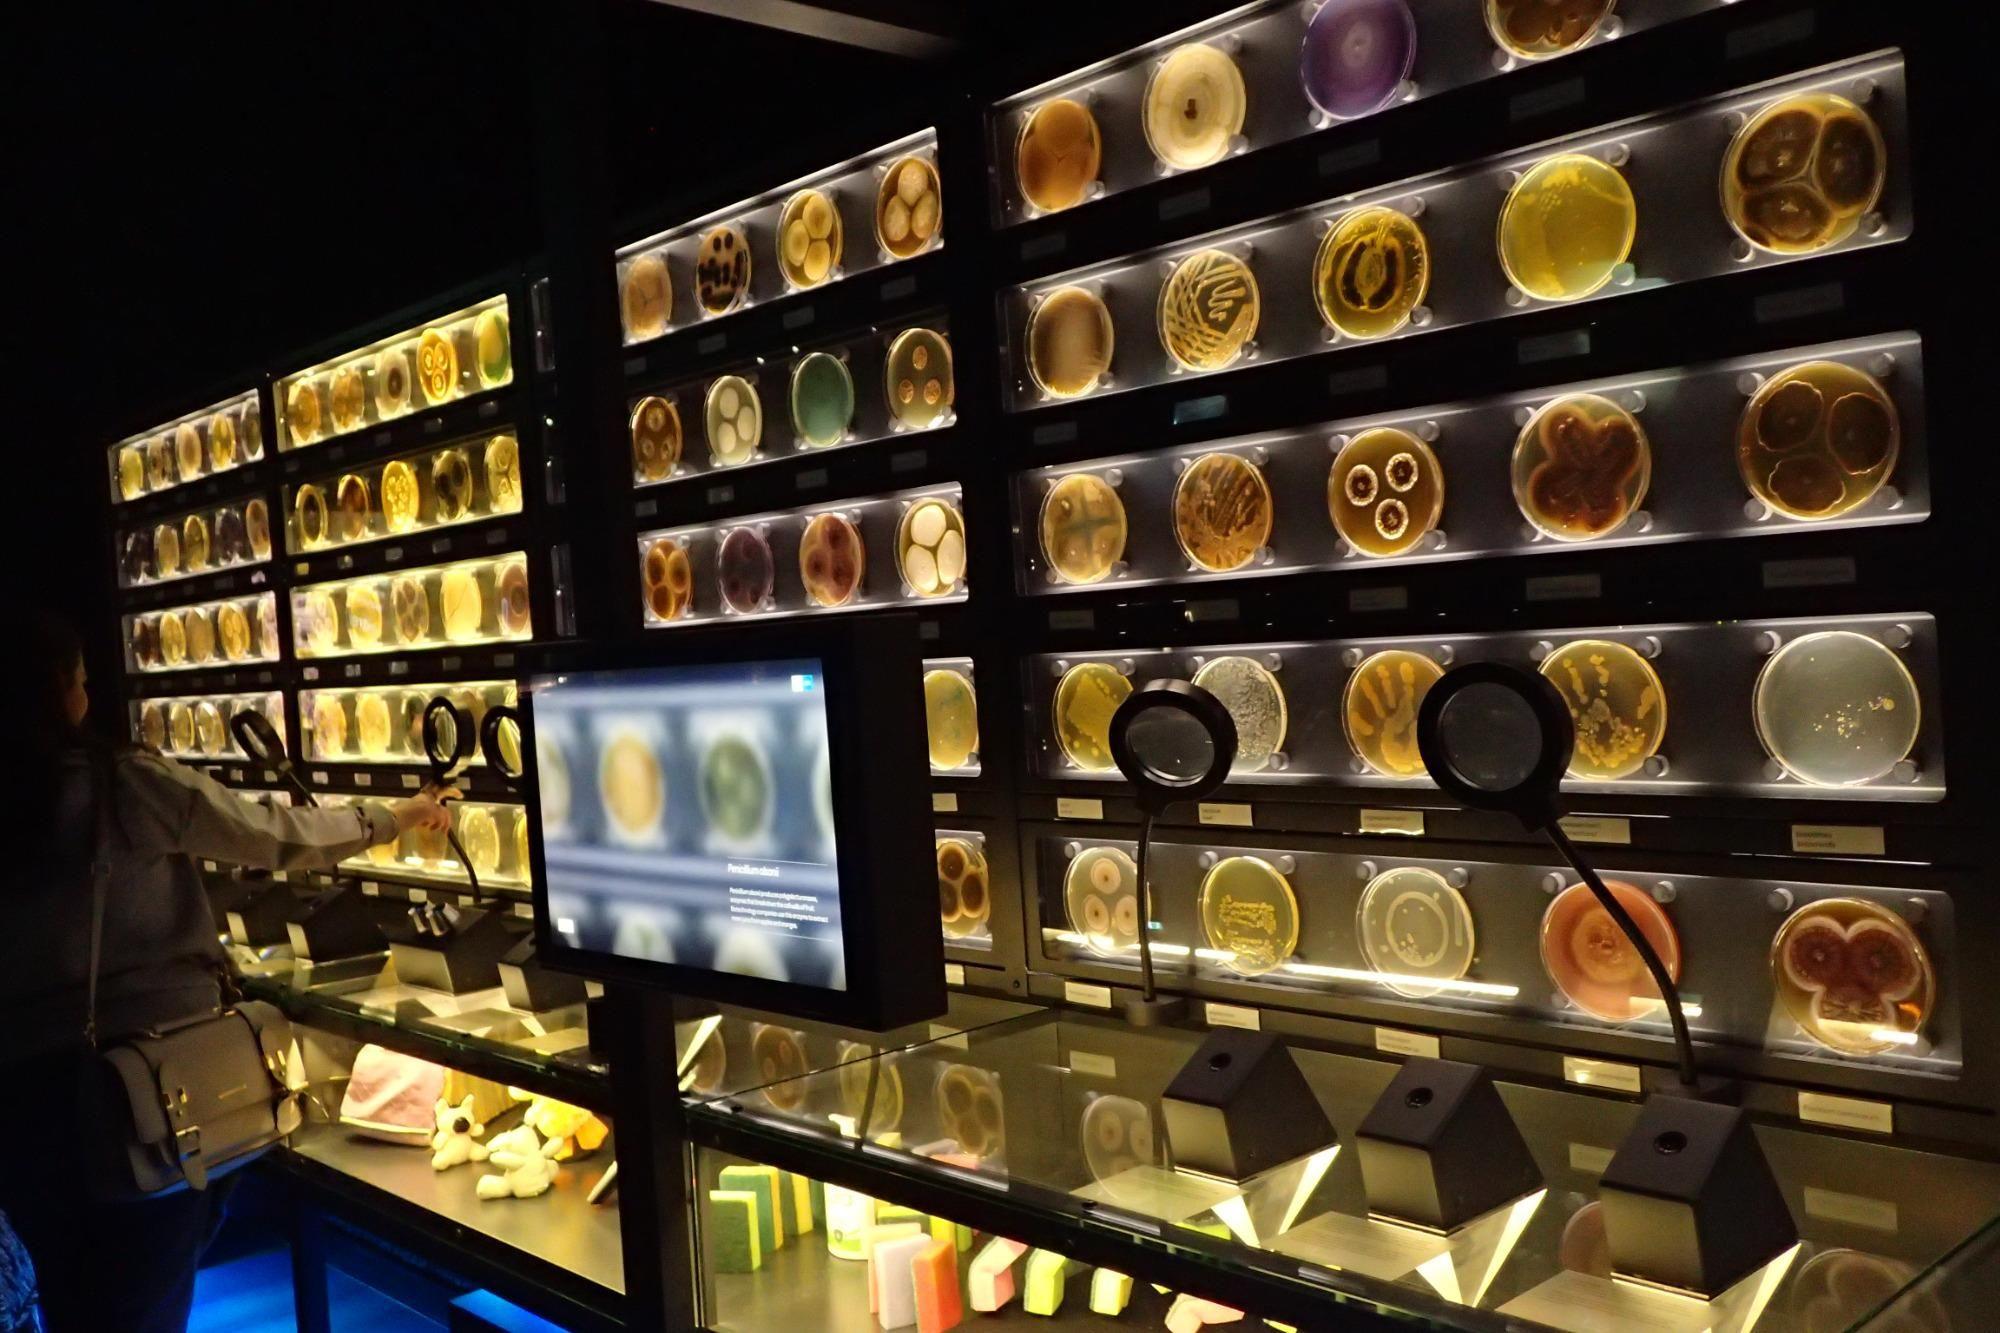 Micropia Microscopic Museum Amsterdam The Netherlands